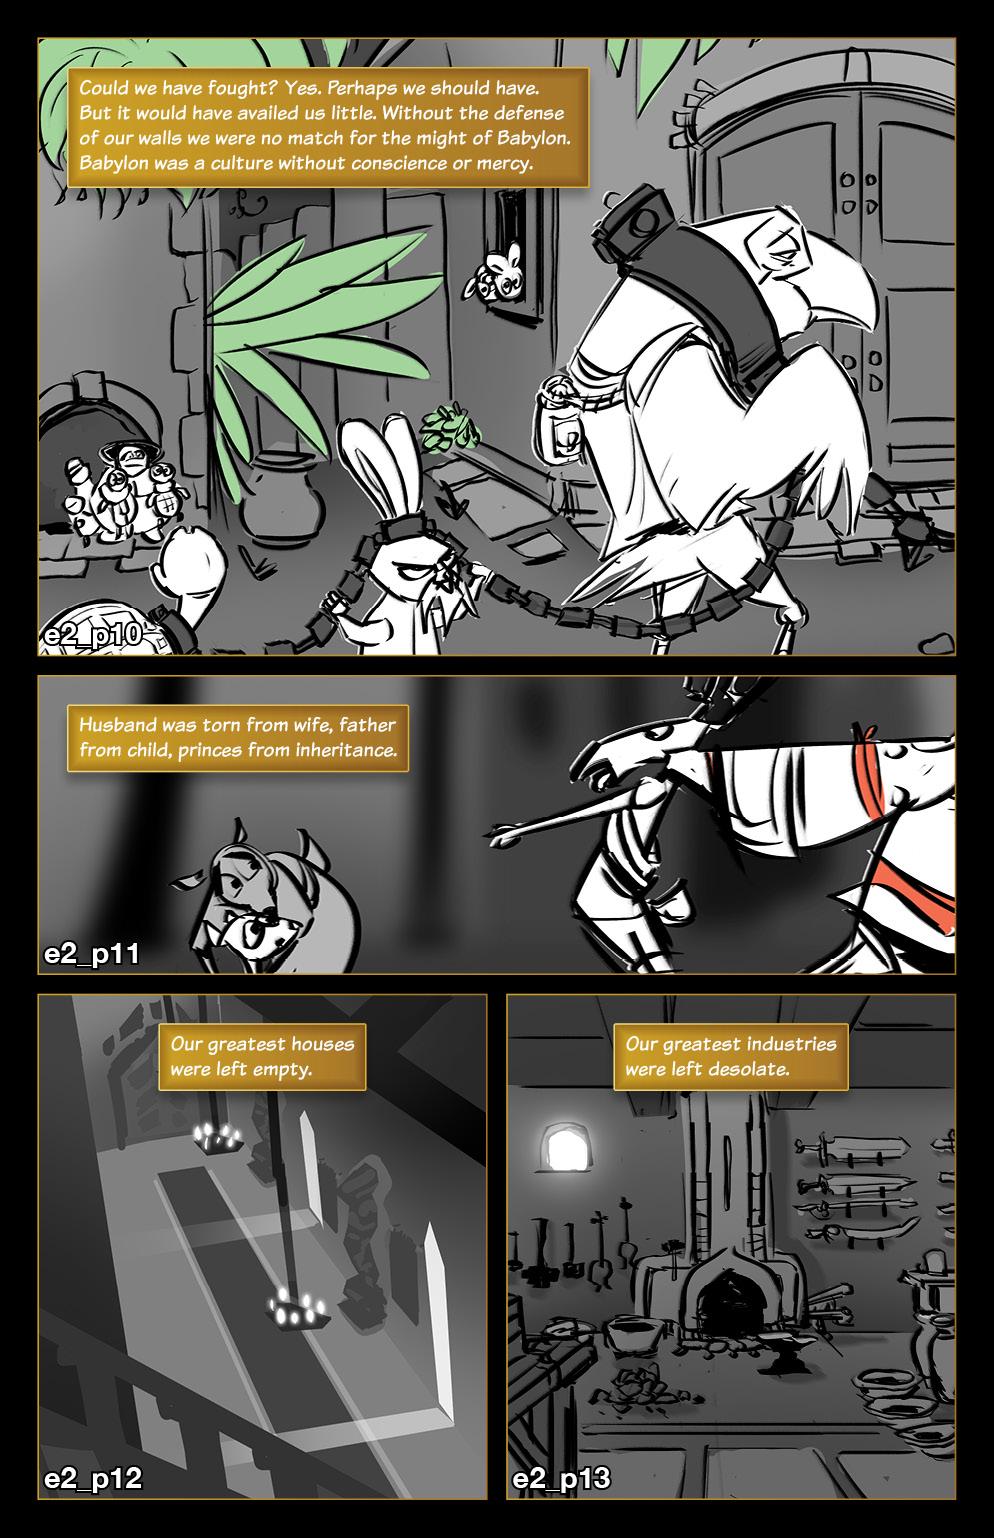 e2_storyboards_7.jpg